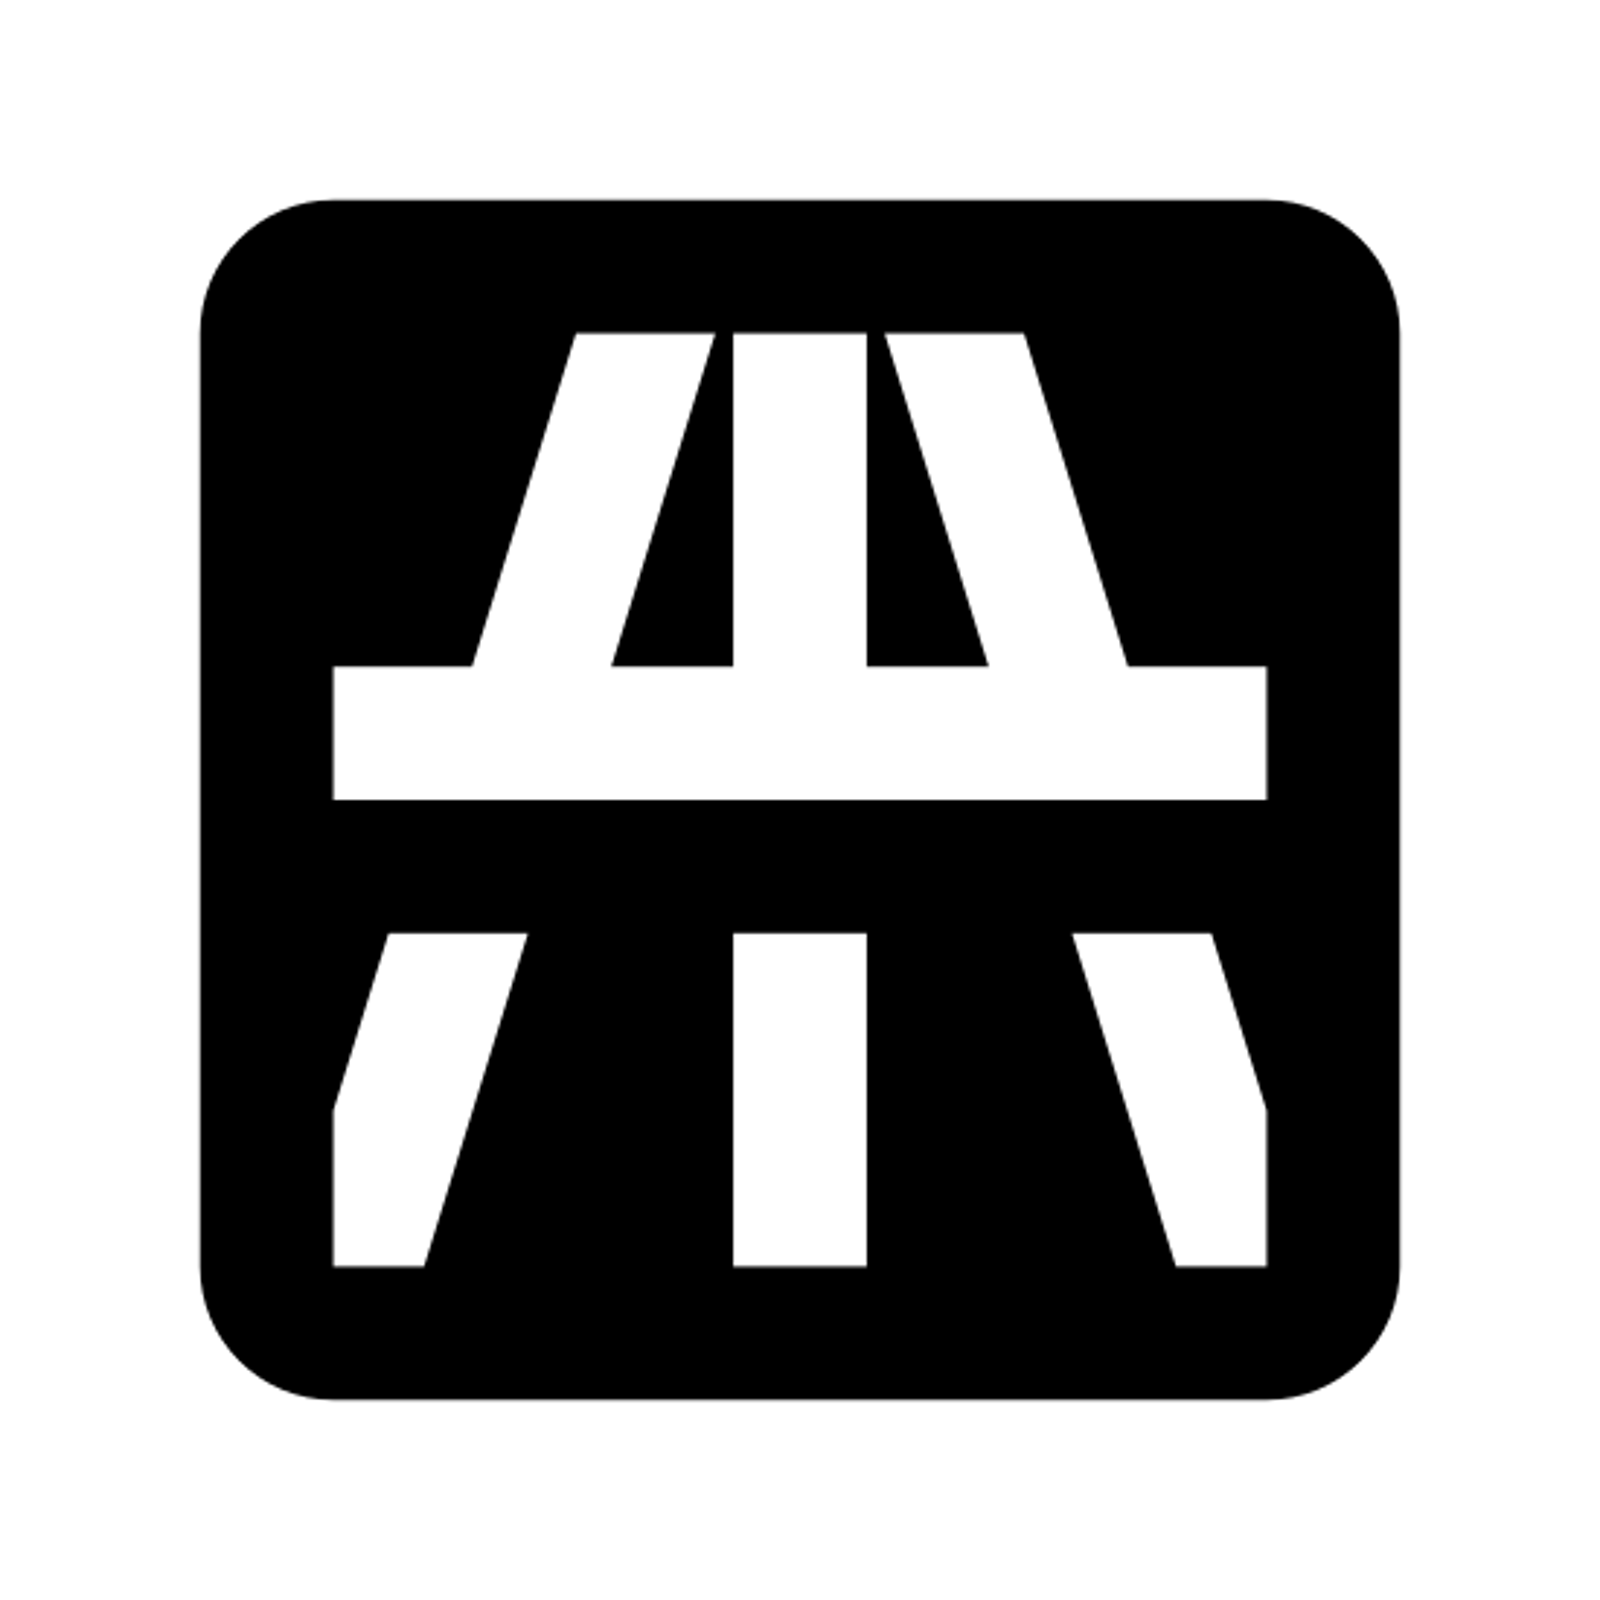 Autostrada icon